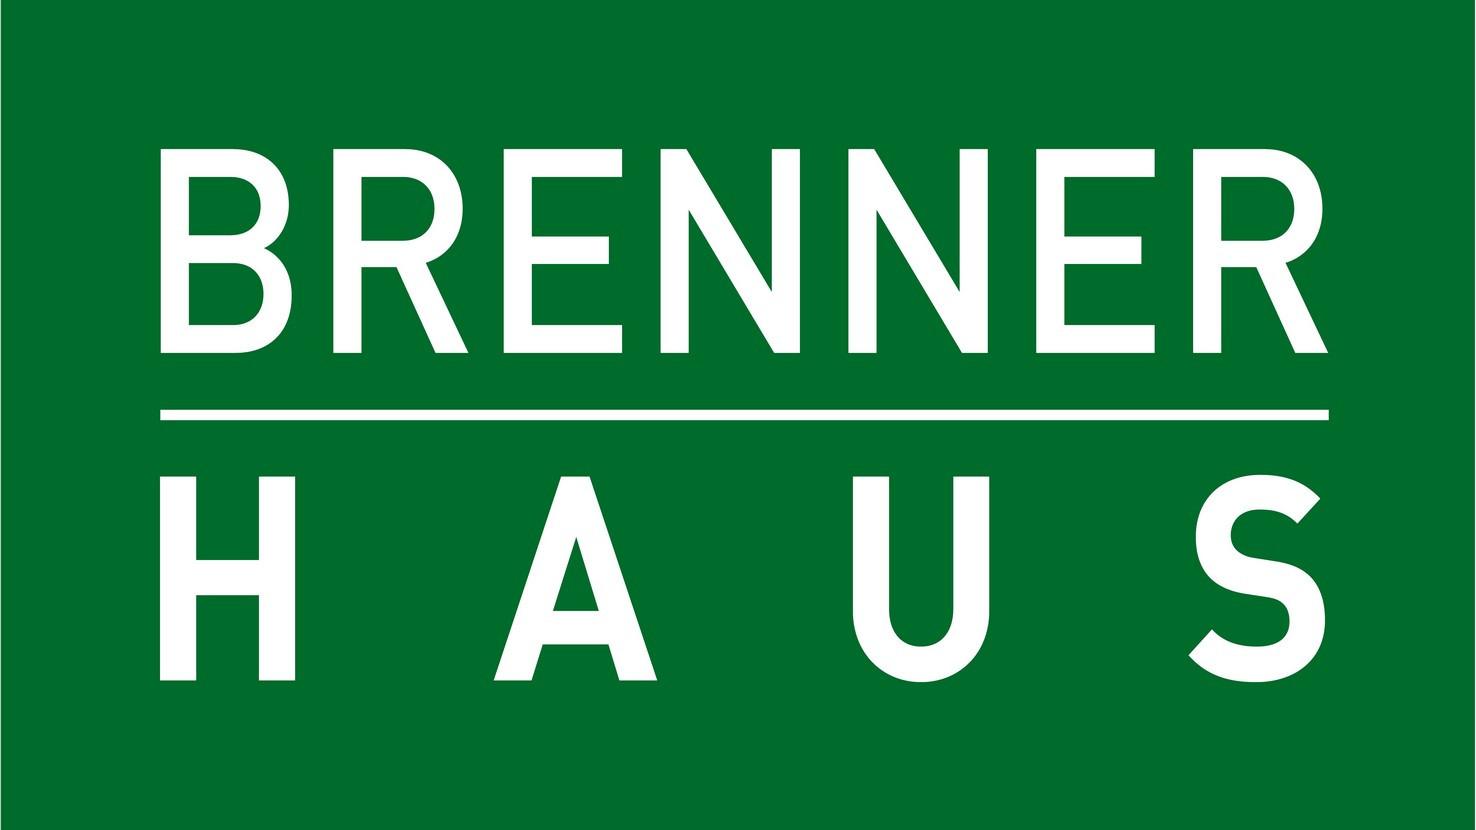 Brennerhaus.jpg